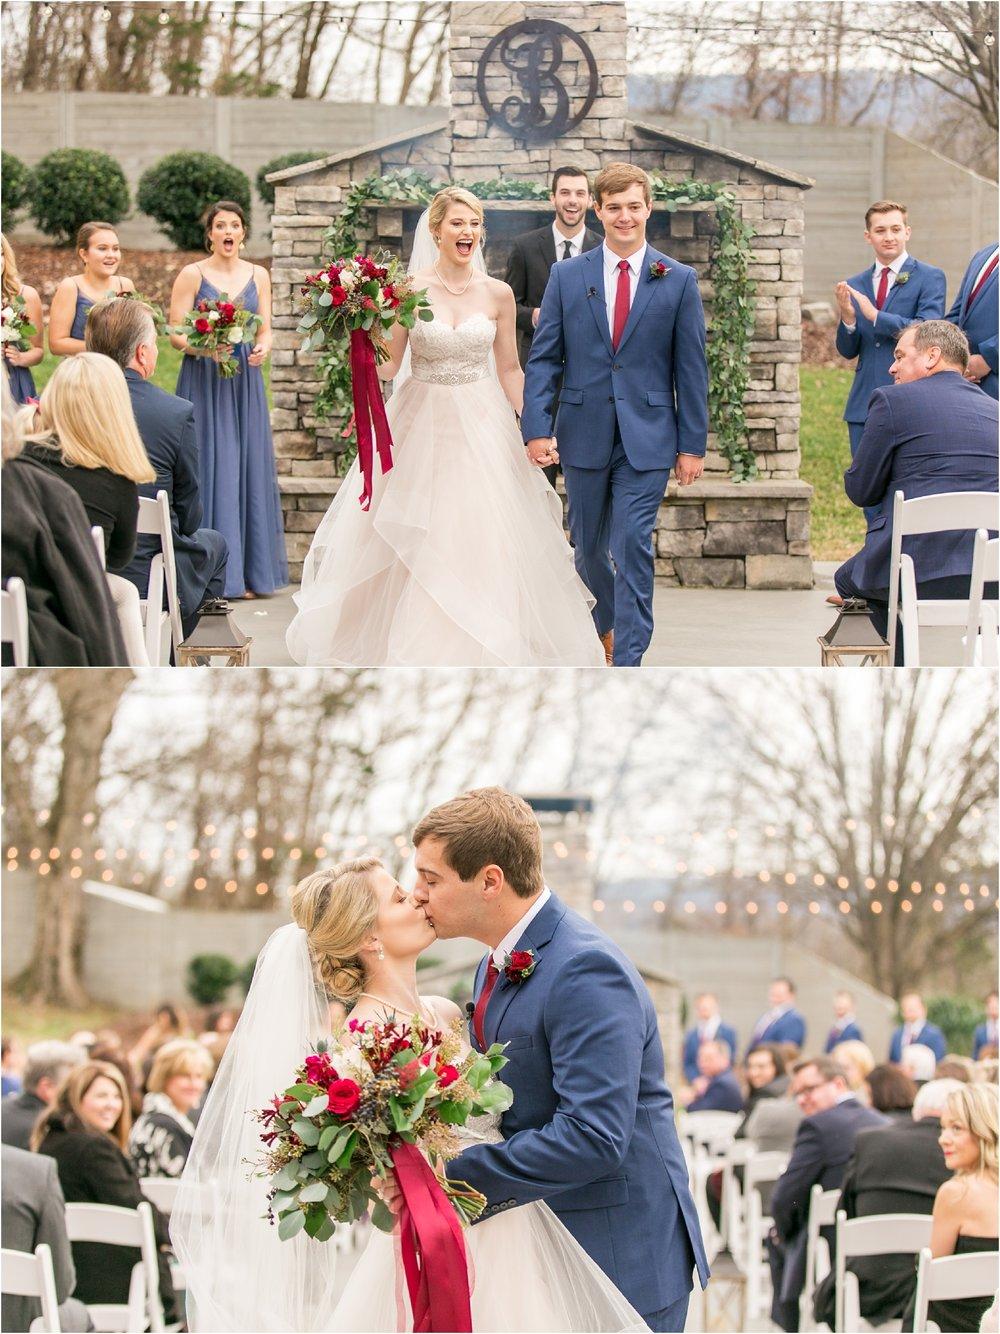 Savannah Eve Photography- Brandon-Brown Wedding-65.jpg